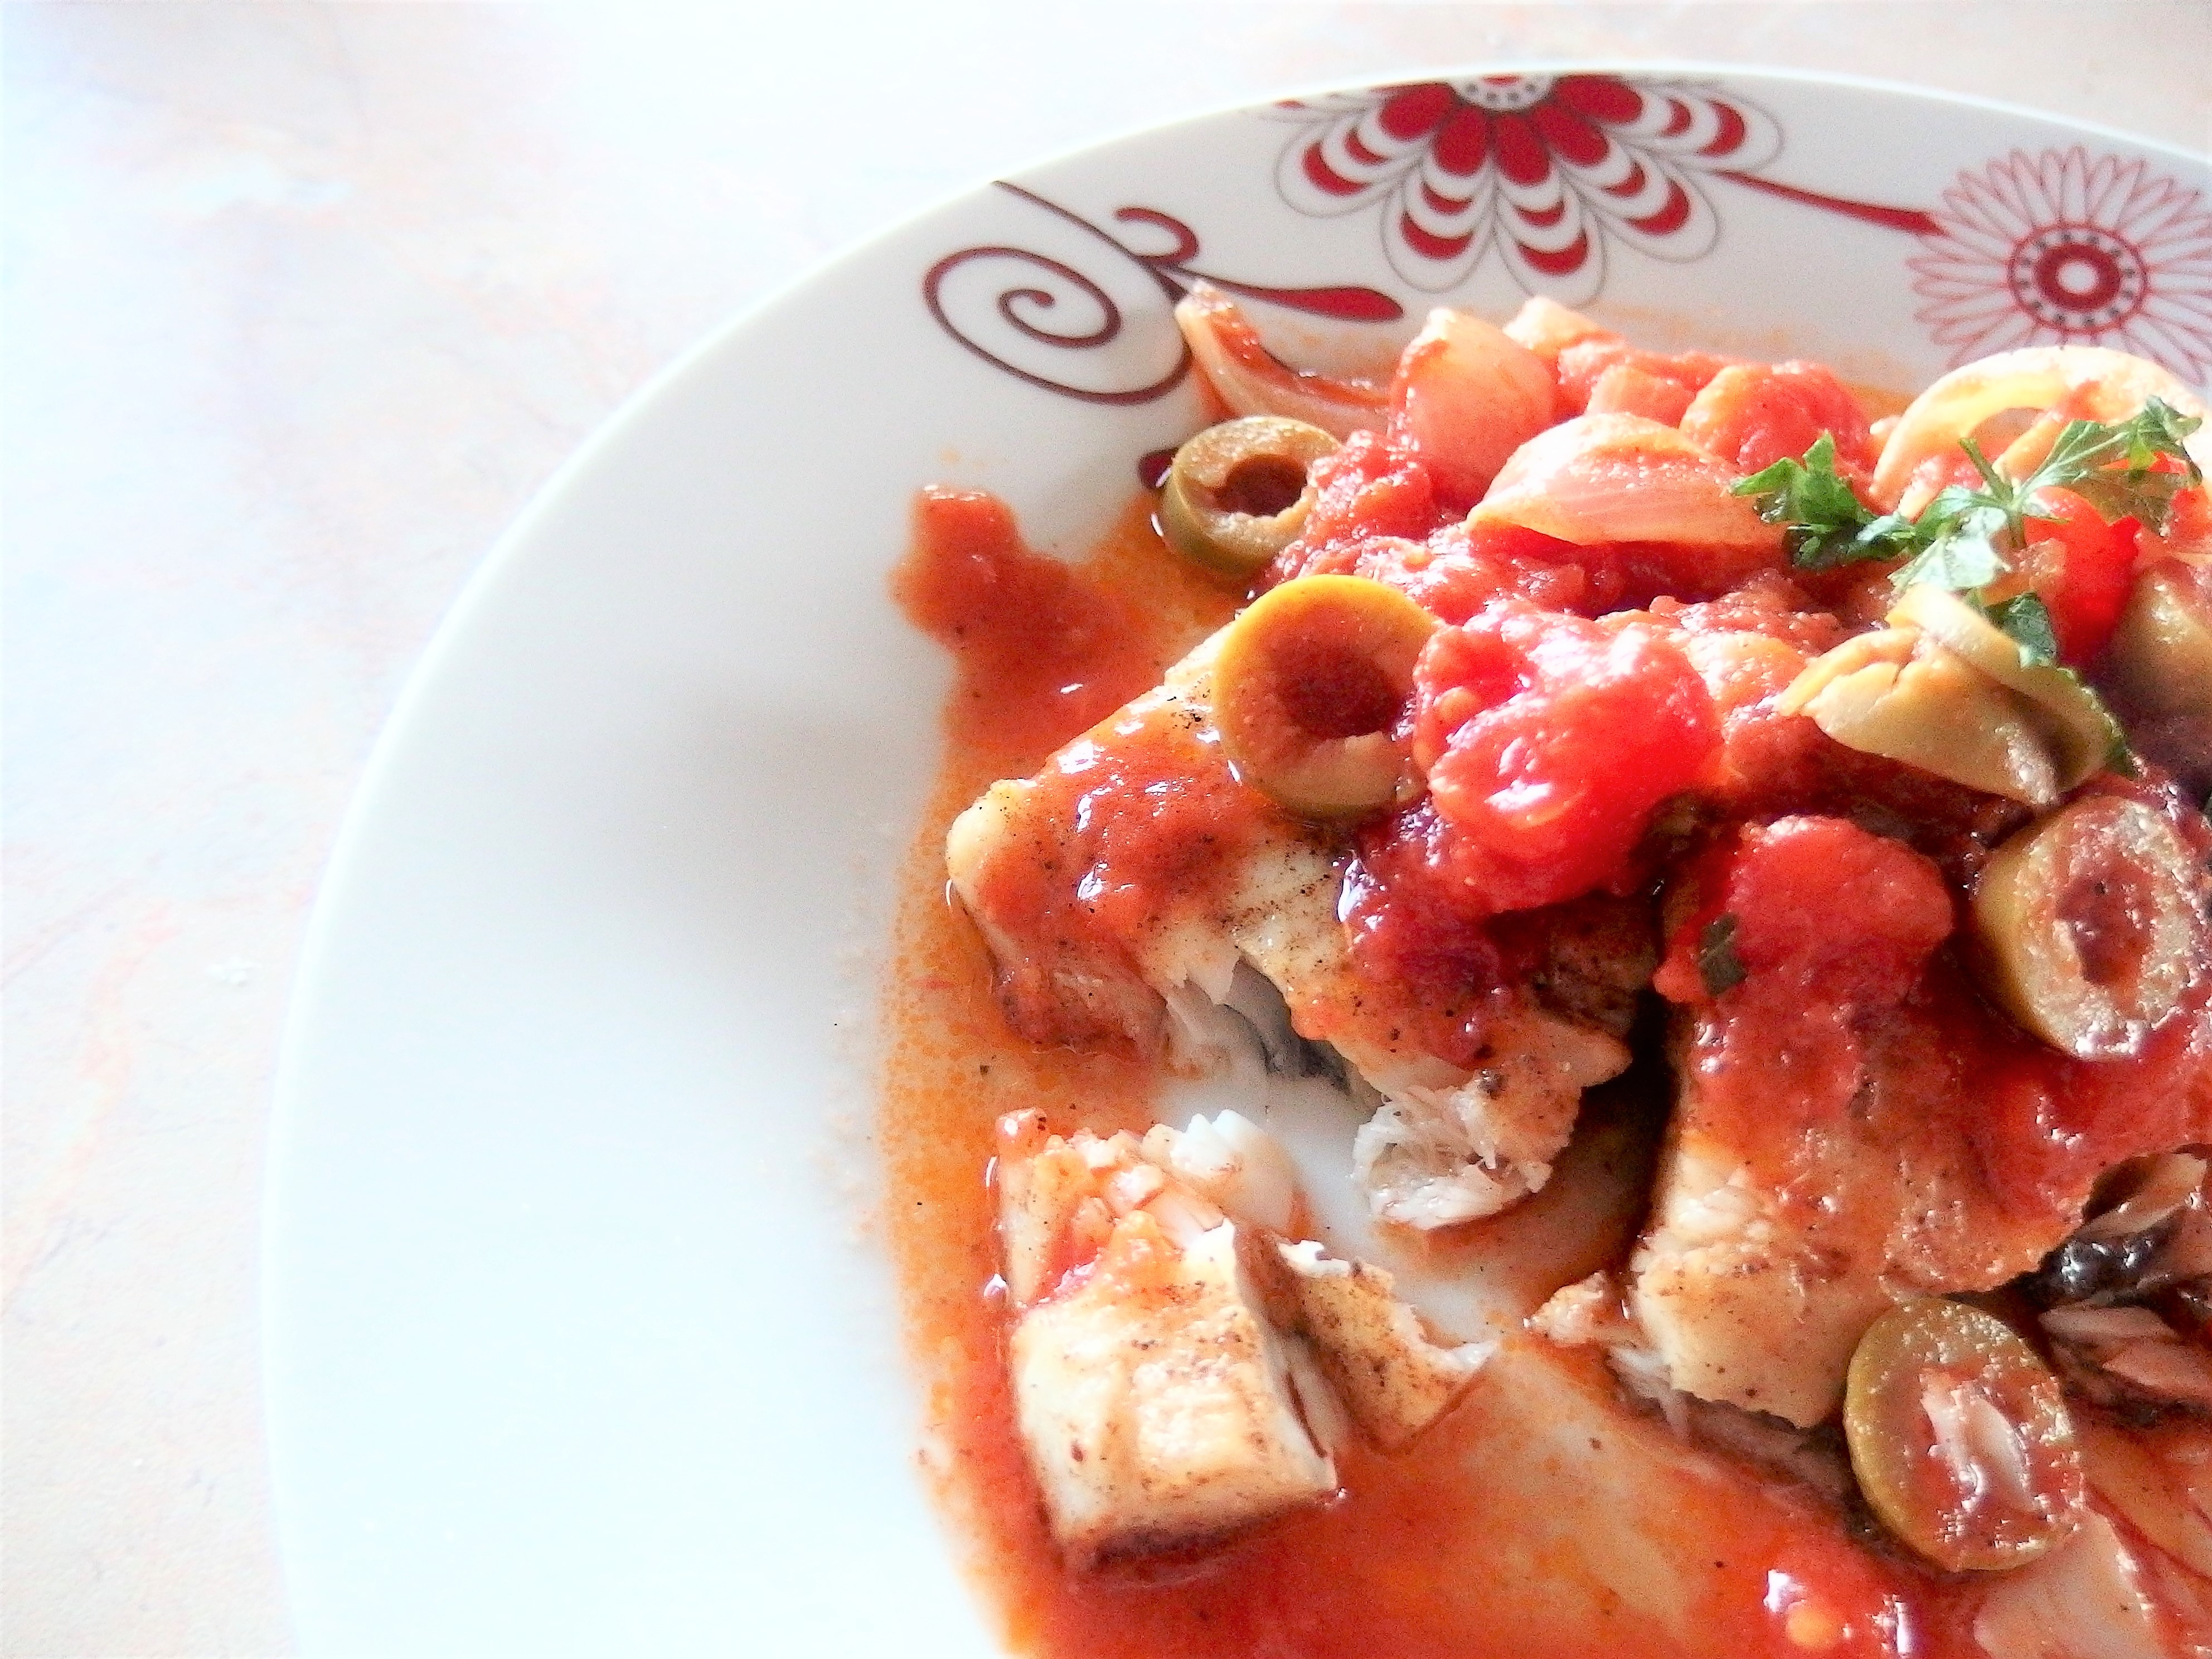 Ryba po włosku